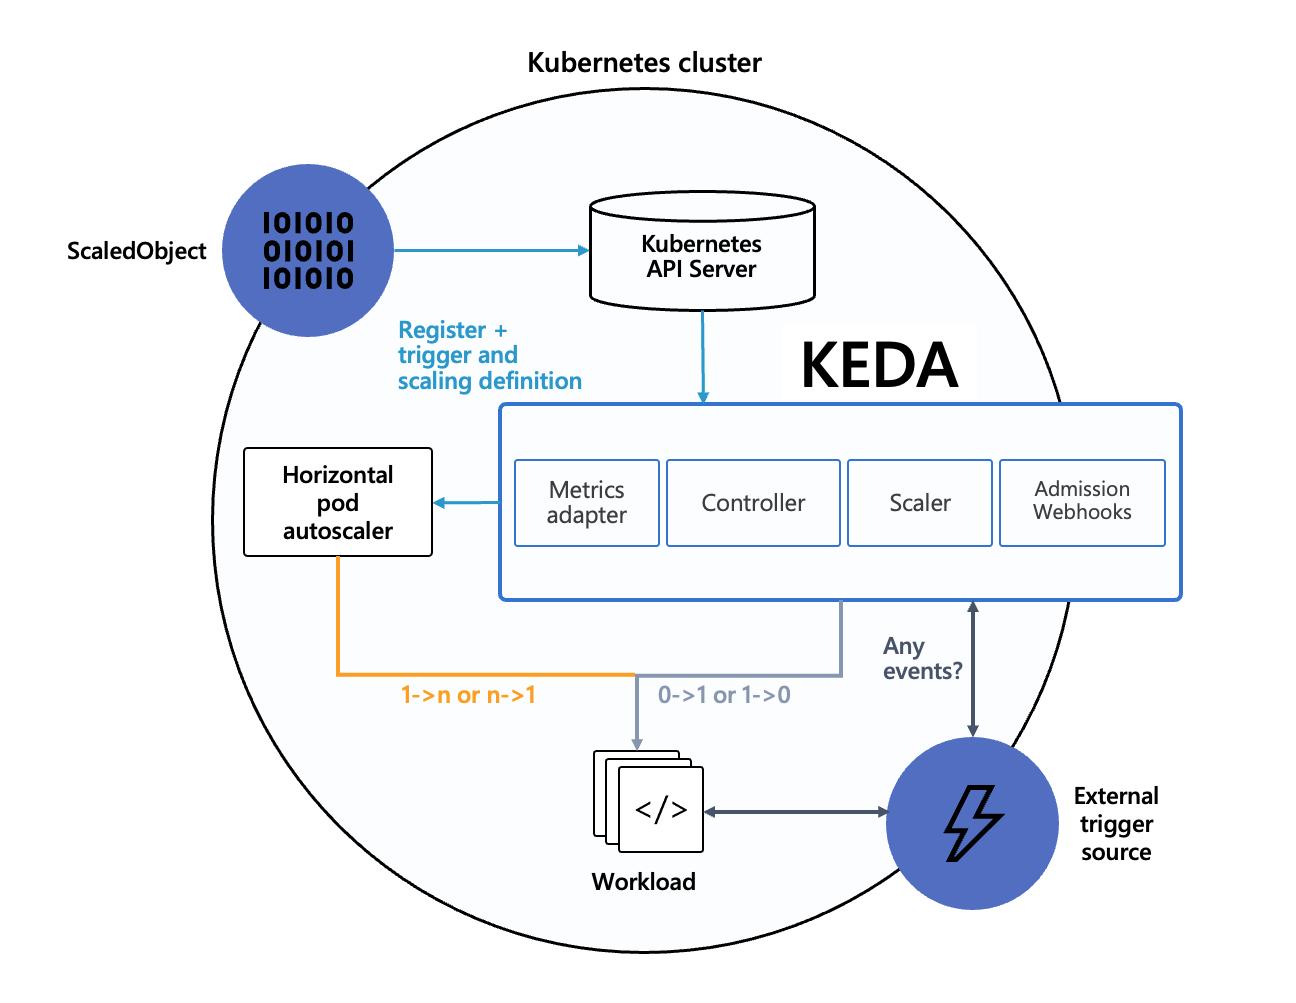 KEDA architecture